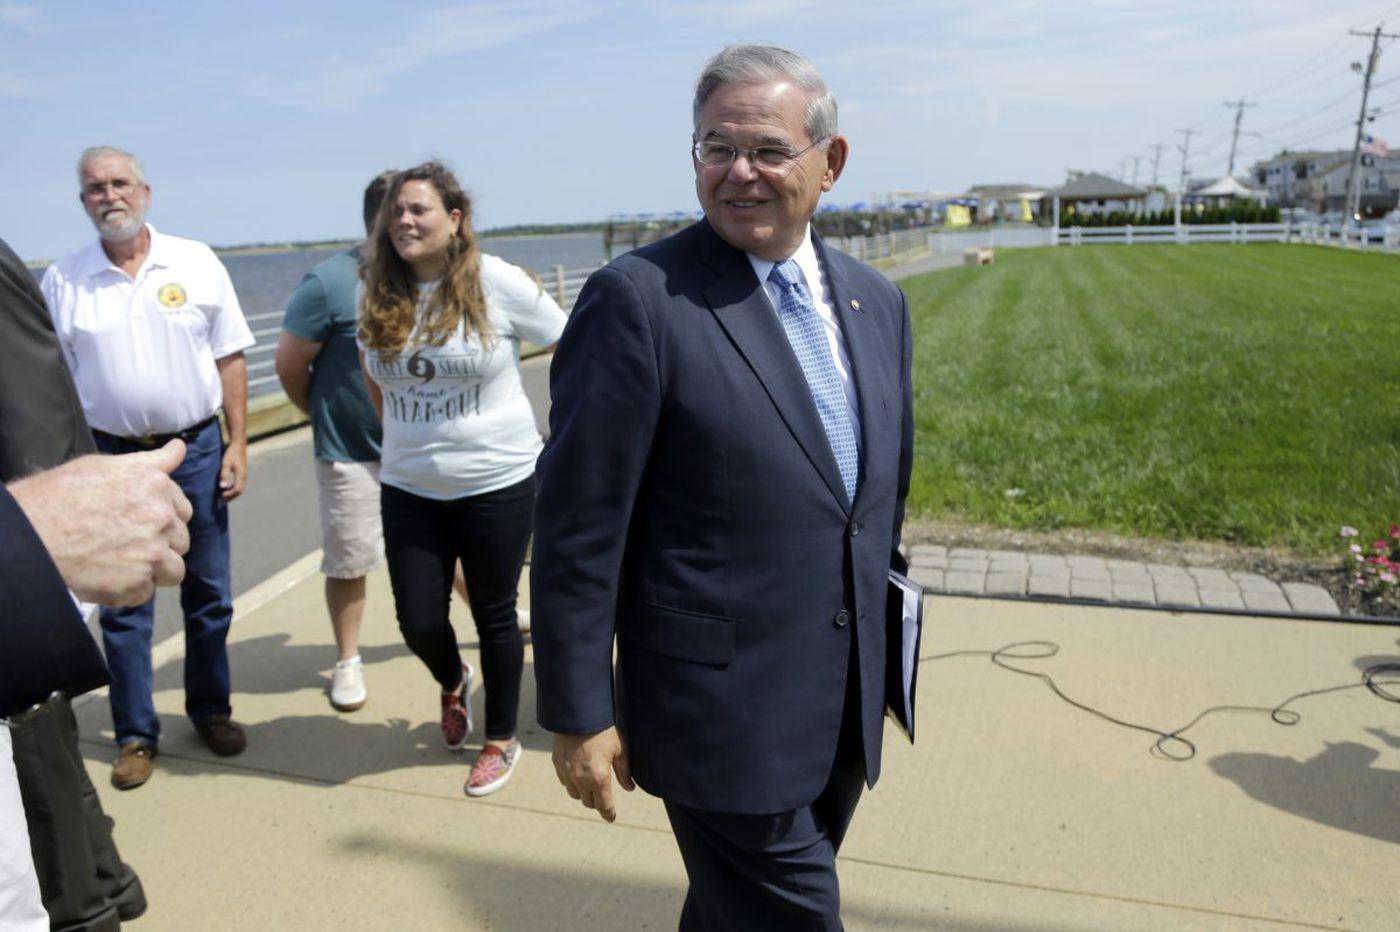 Bribery trial for U.S. Sen. Bob Menendez to open